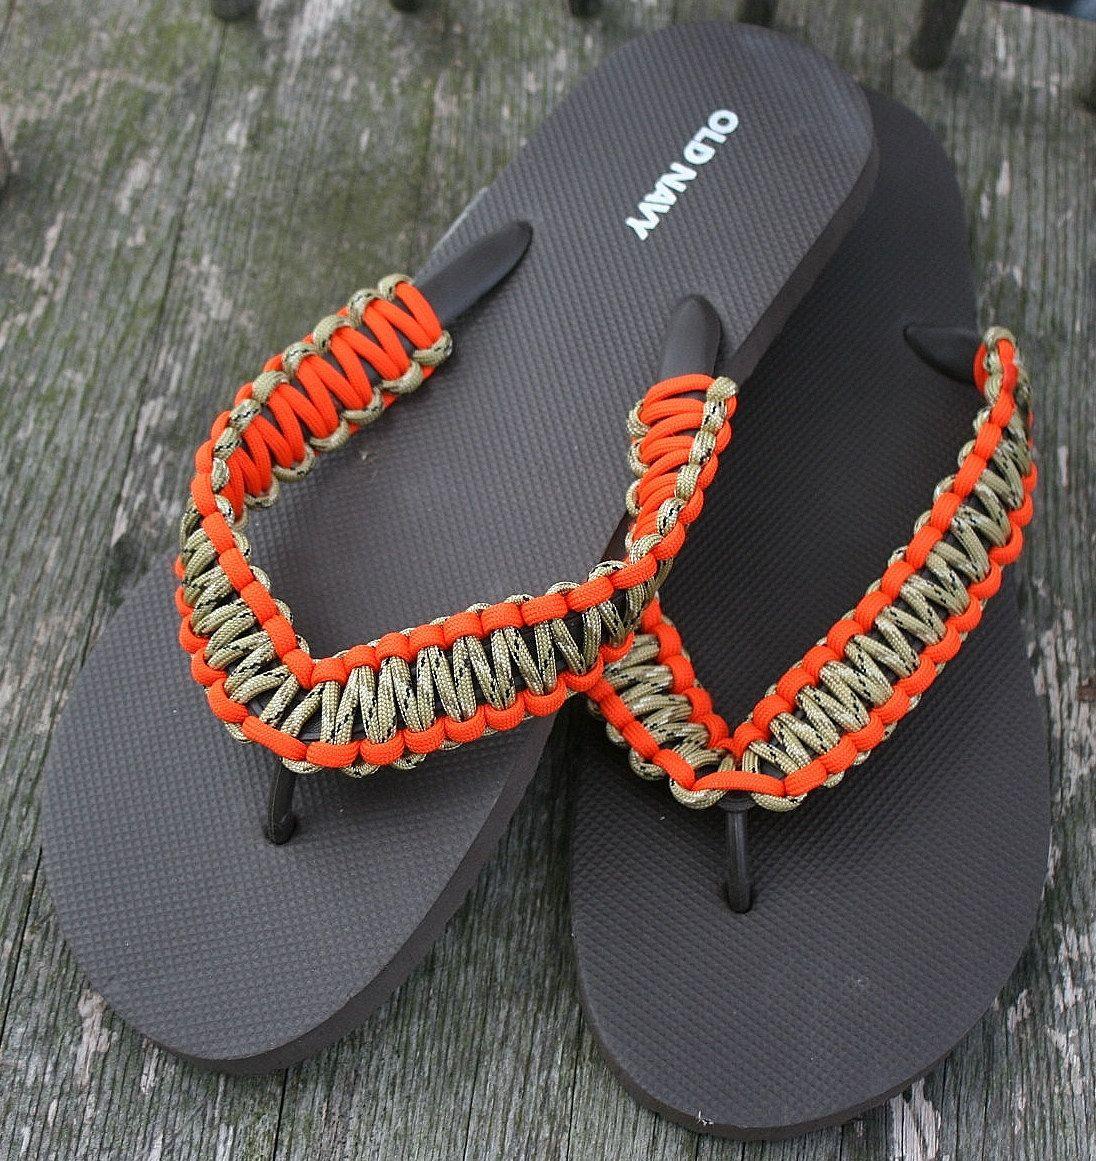 Neon Orange And Camo Brown Paracord Flip Flops Shoes Mens